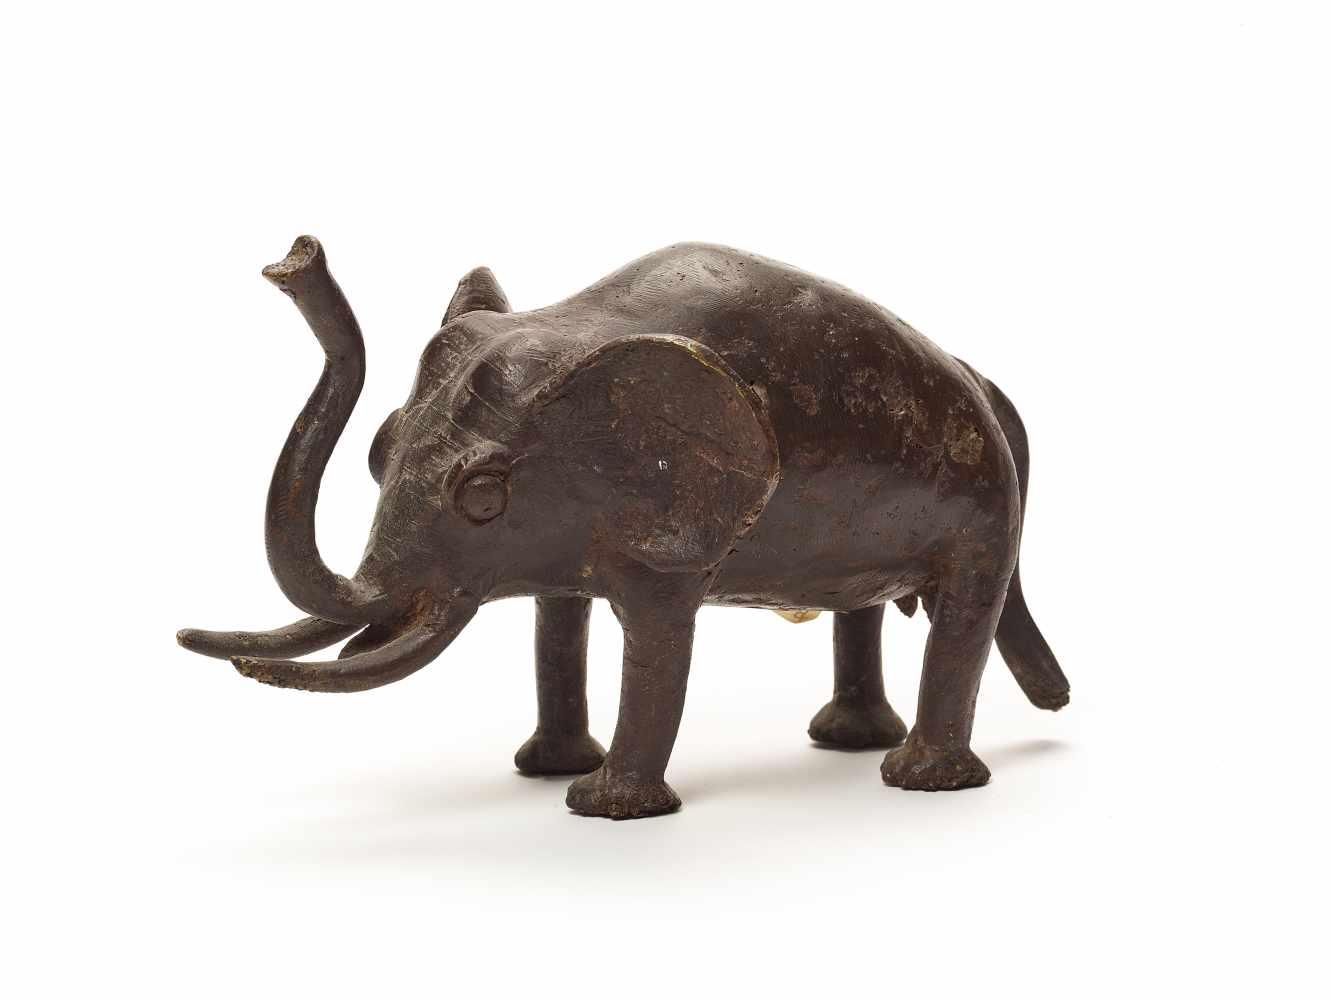 BRONZE ELEPHANT – BOBO PEOPLEBronzeBobo-Dioulasso, Burkina Faso, West Africa; 20th century This